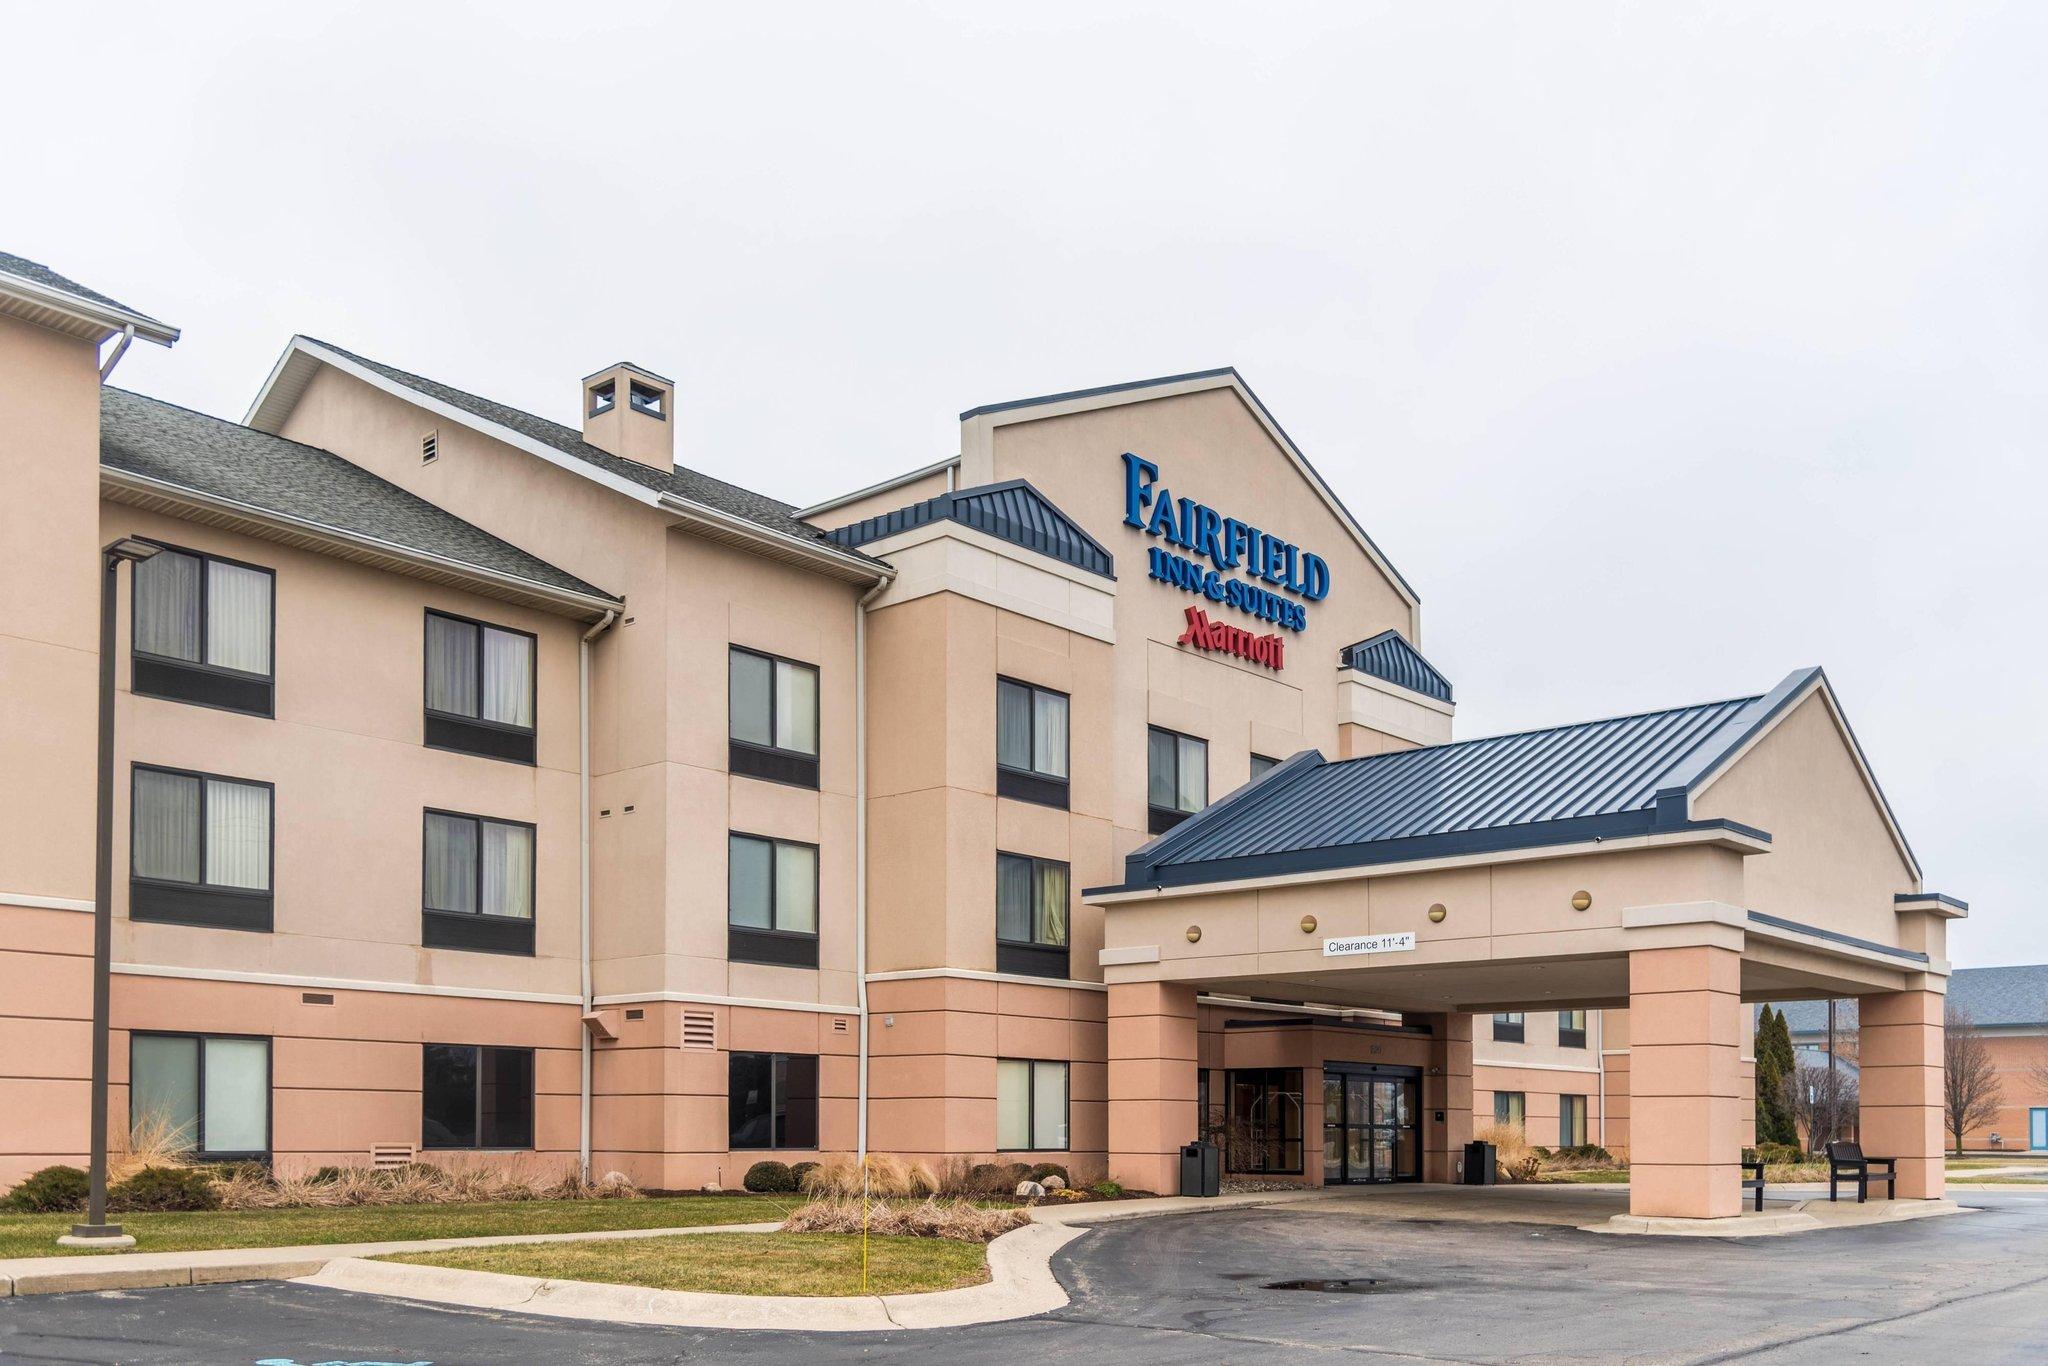 Fairfield Inn & Suites Muskegon